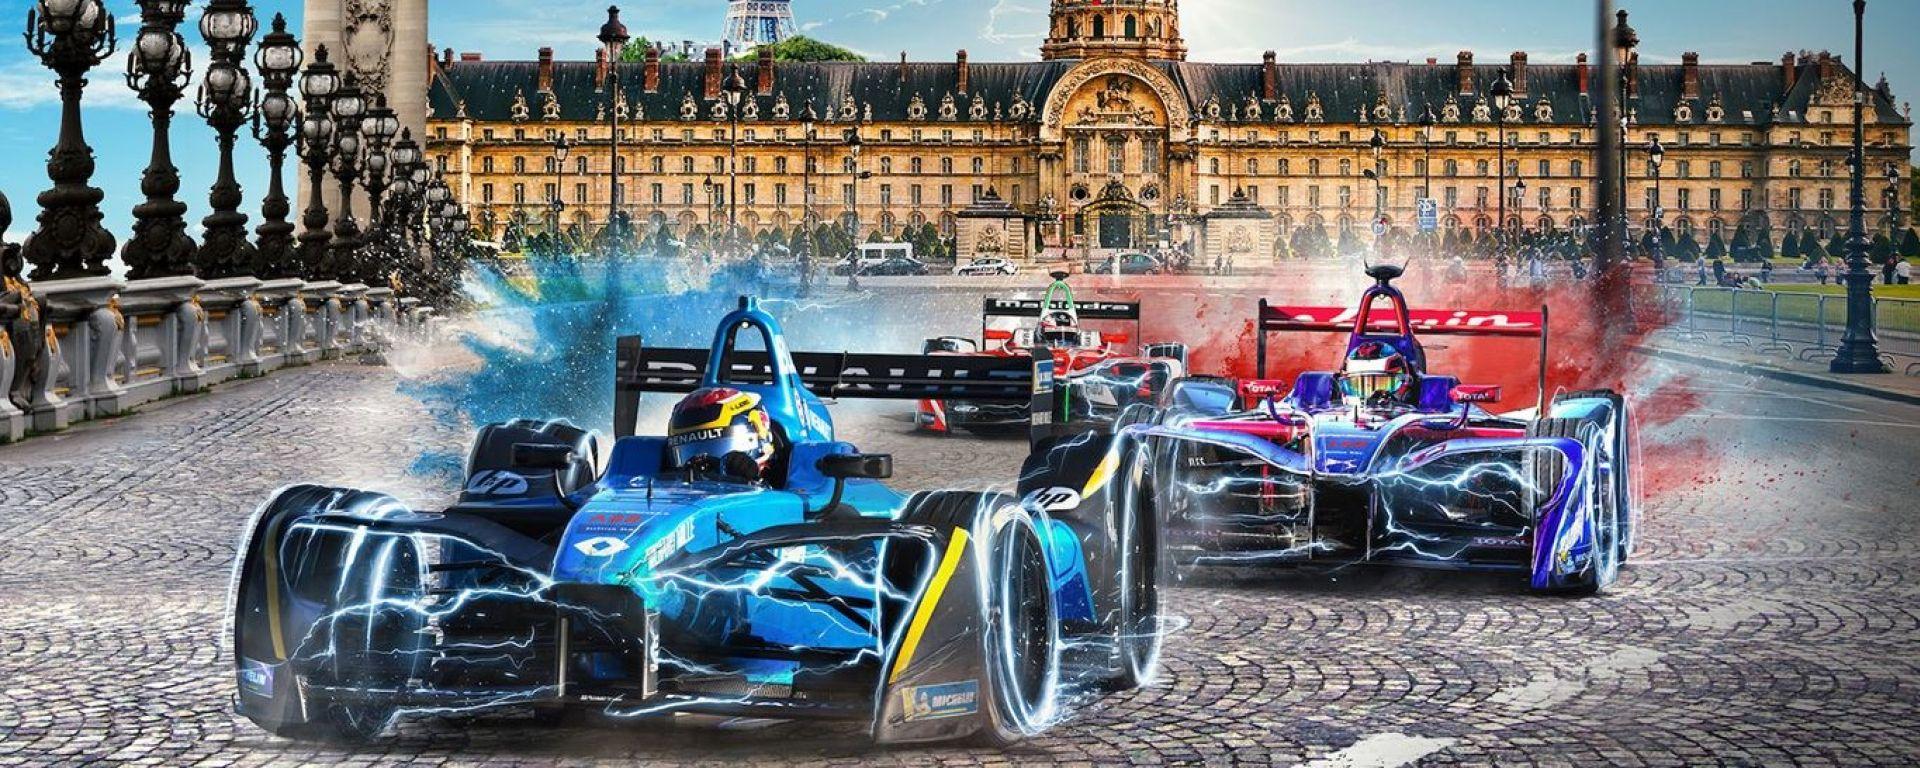 Formula E GP Parigi 2018, tutte le info: orari, risultati prove, qualifica, gara